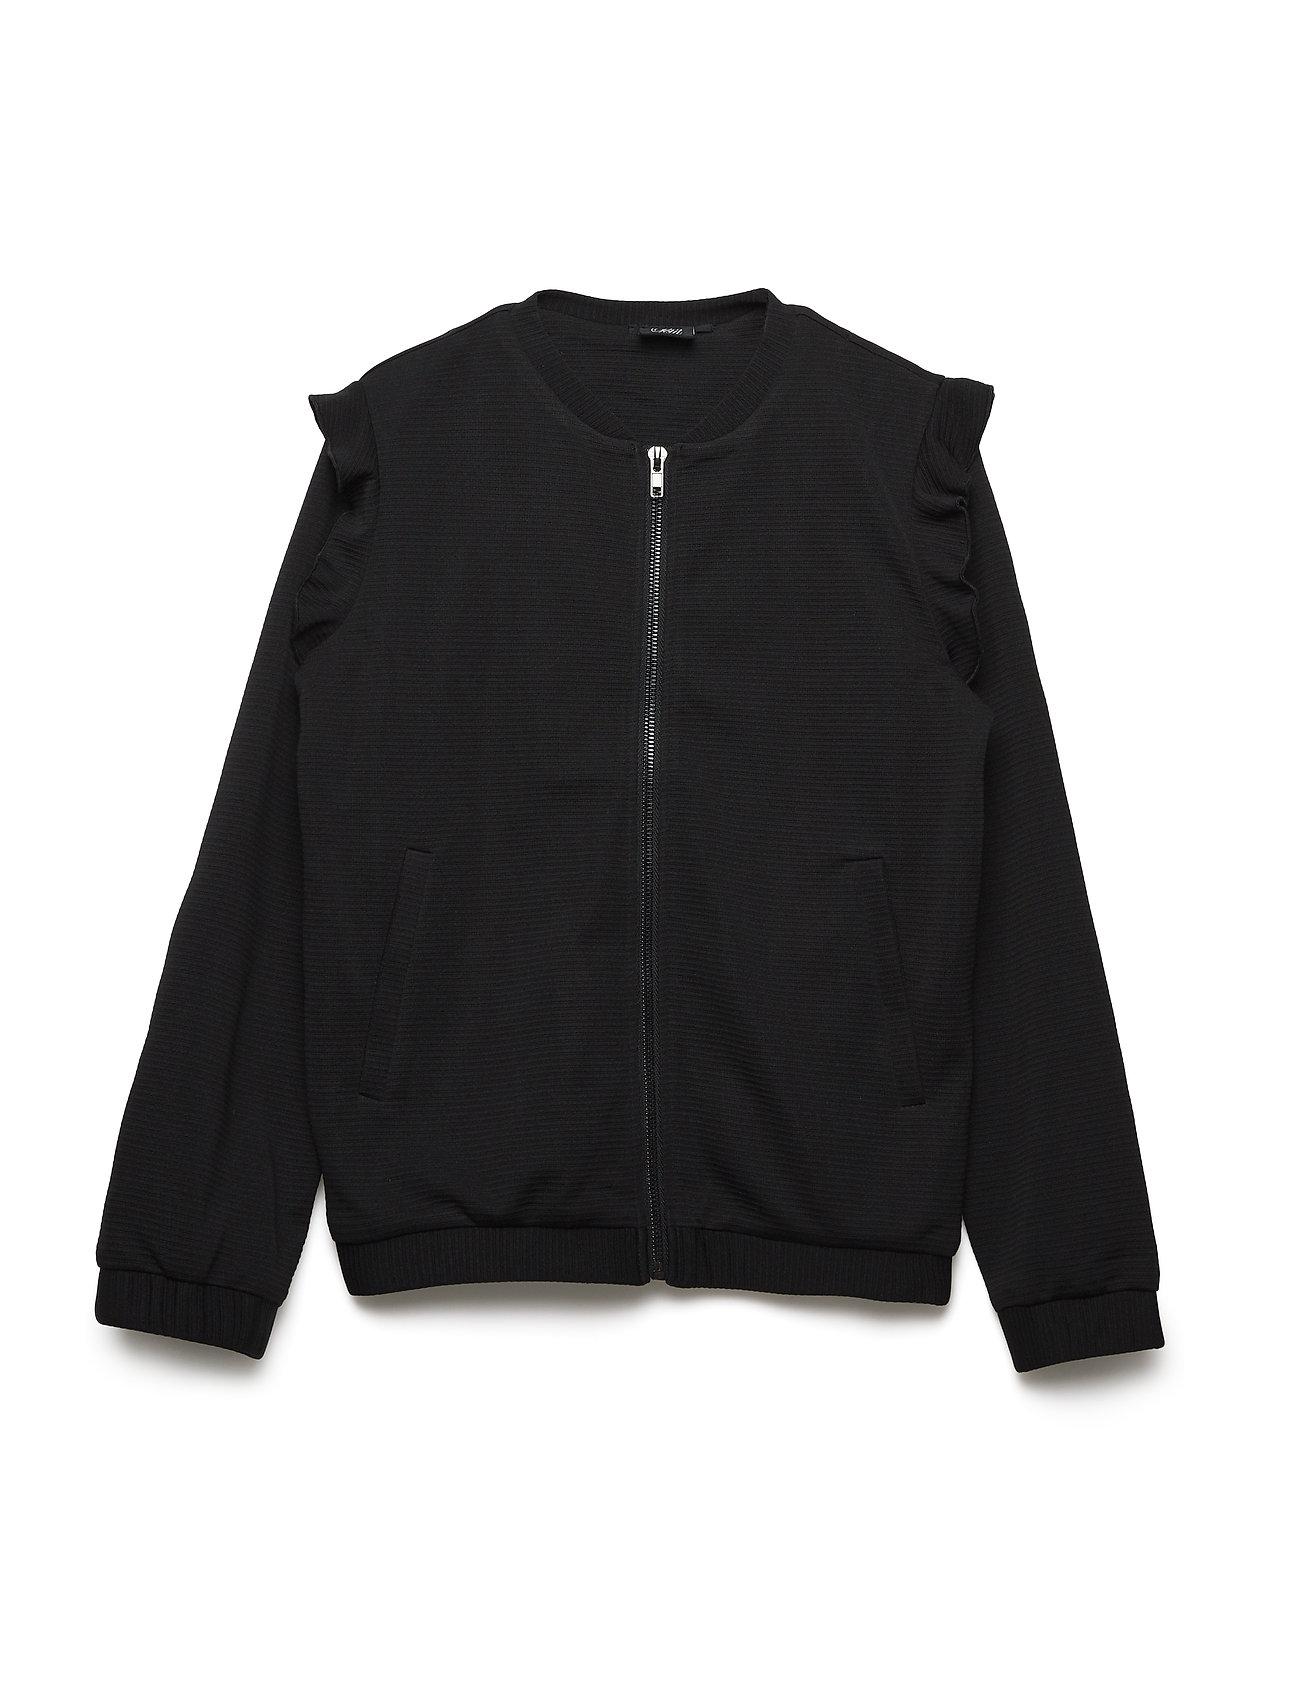 b034ef678f83 Bomber Jacket (Black) (£29.15) - Petit by Sofie Schnoor -